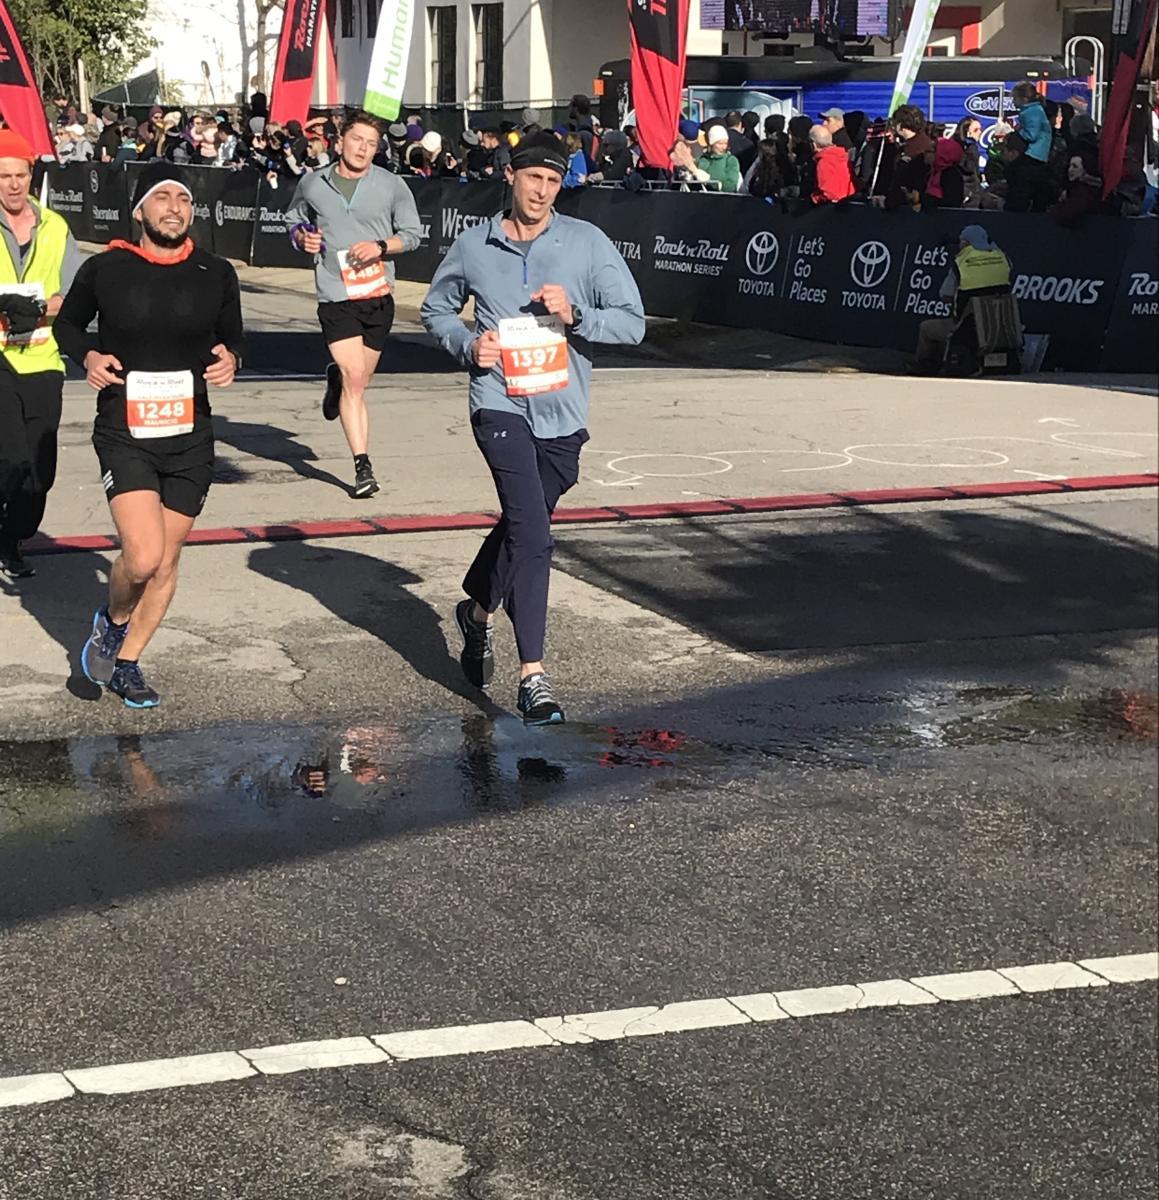 Neil Amato finishing the 2018 Rock 'n' Roll Raleigh Half-Marathon